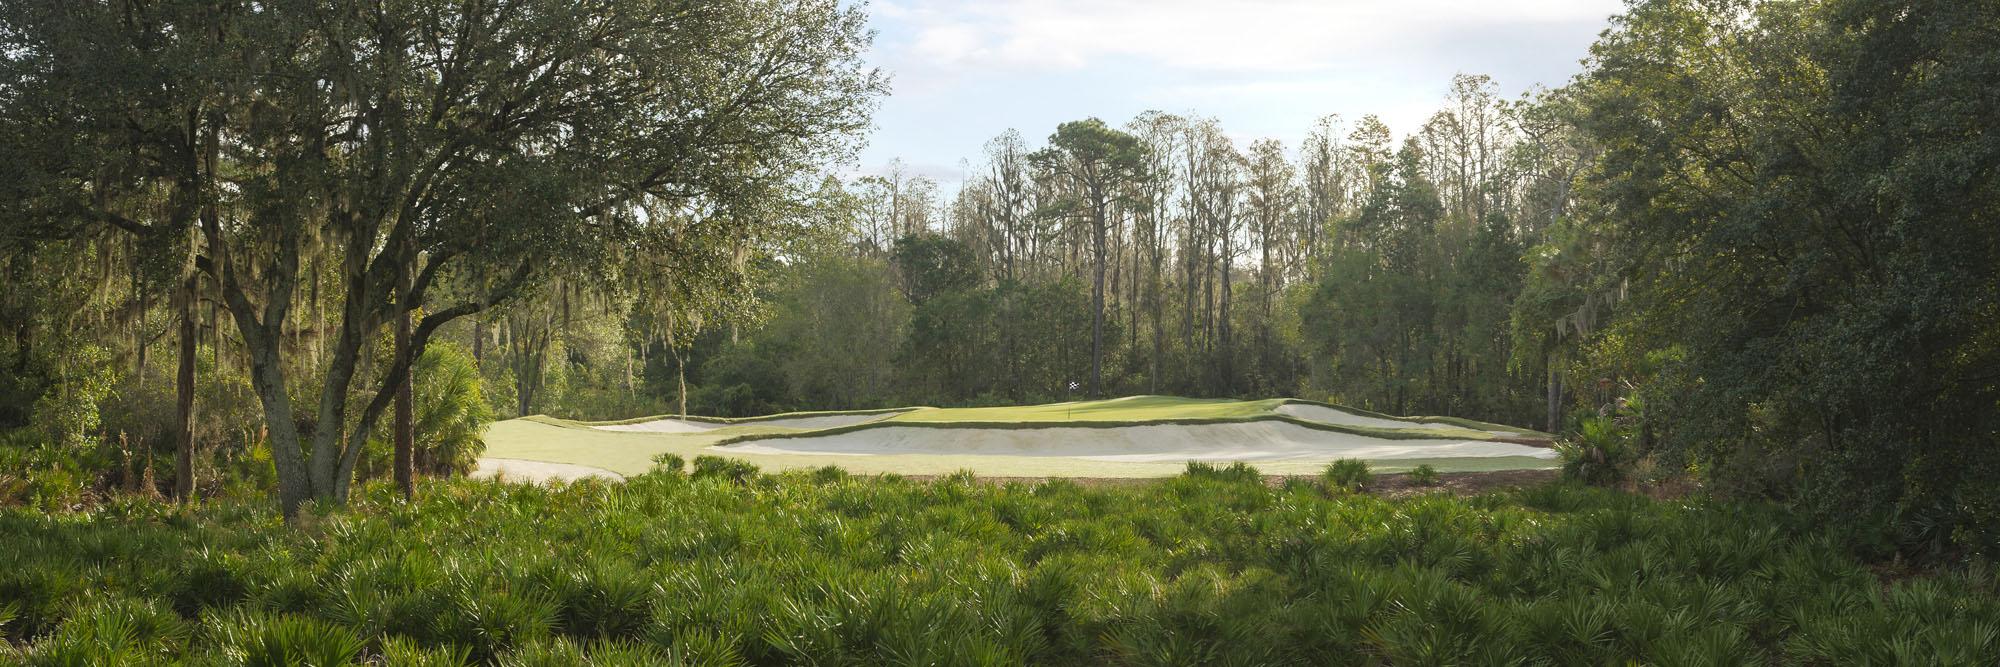 Golf Course Image - Old Memorial Golf Club No. 17